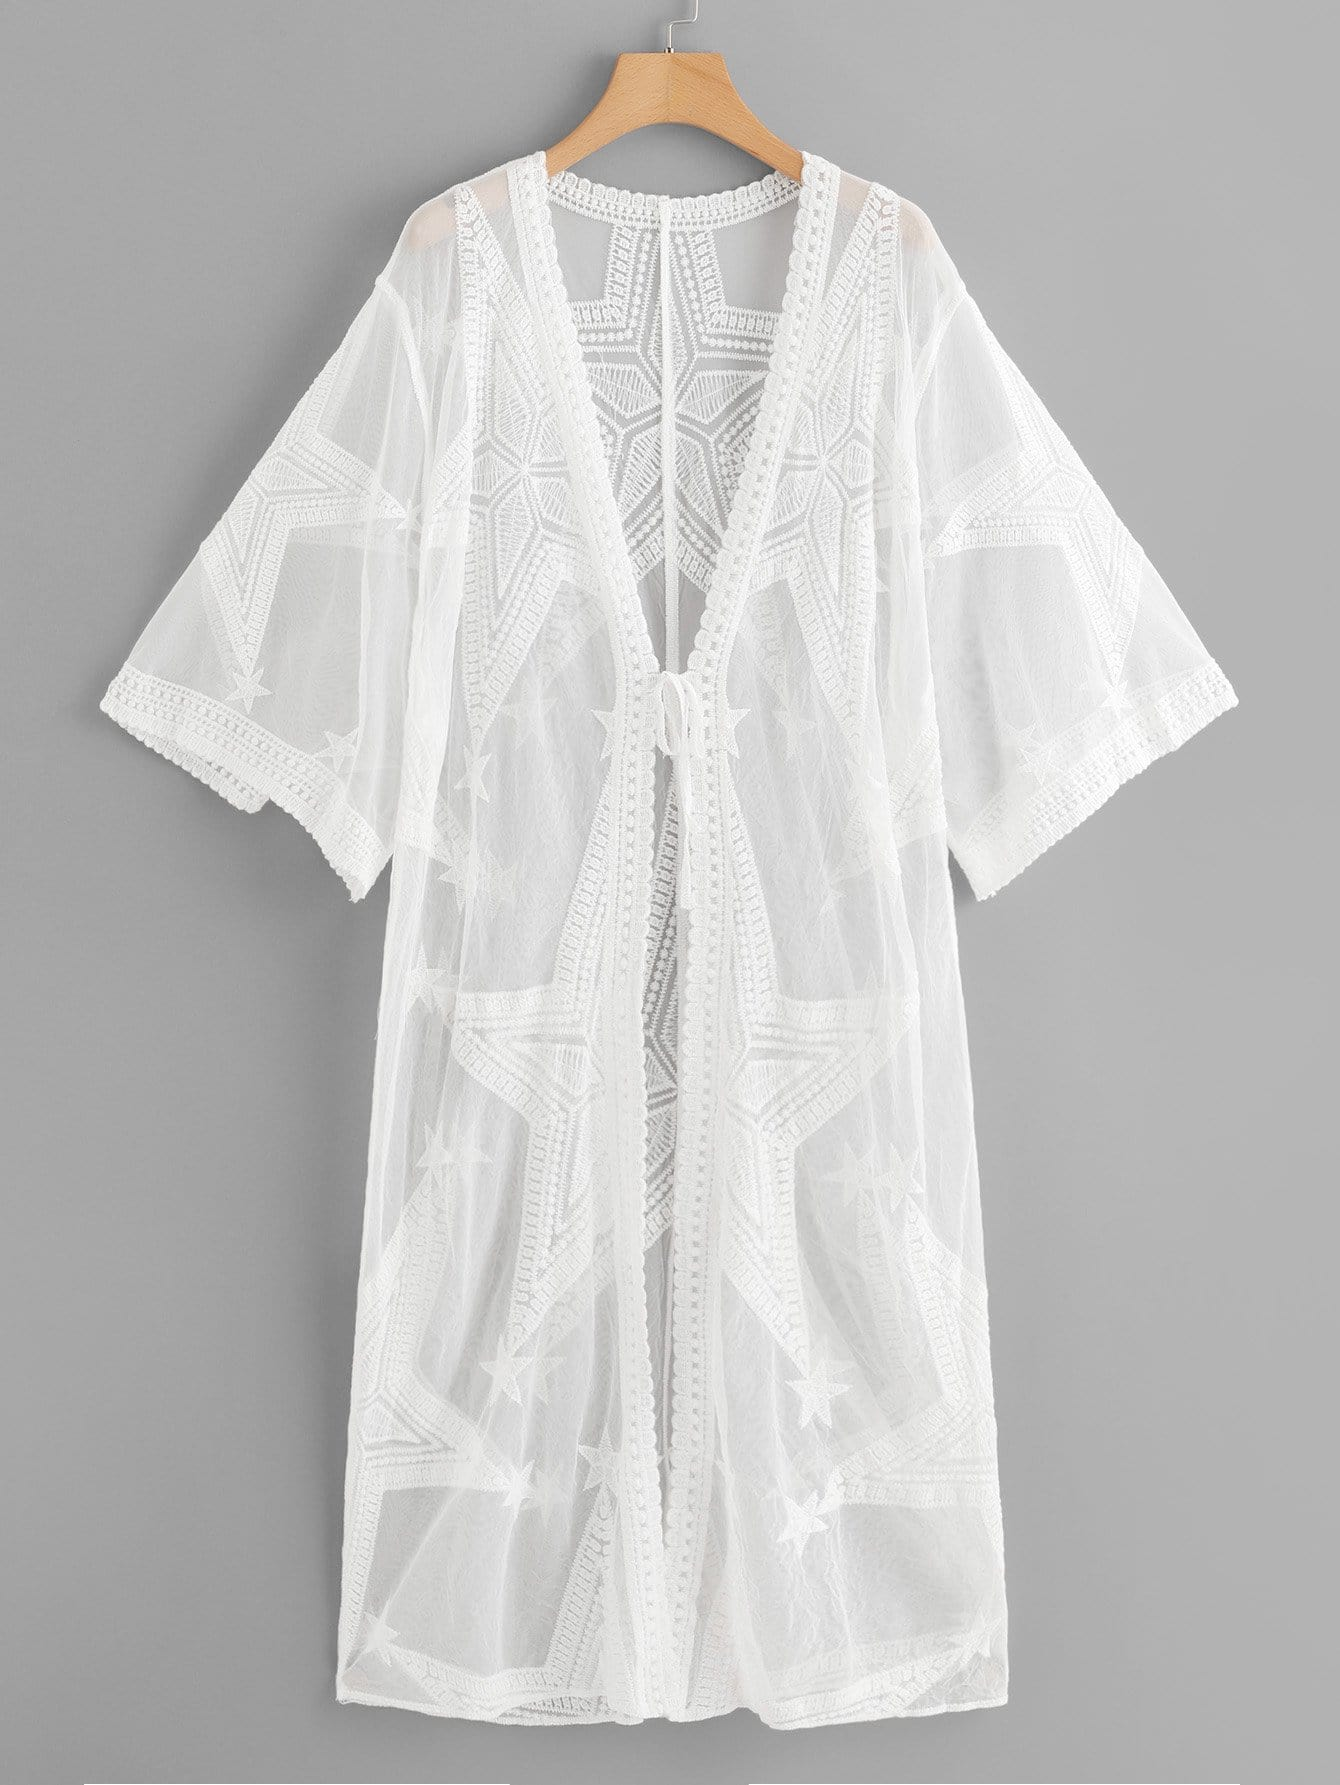 Lace Star Embroidery Sheer Mesh Panel Kimono star sequin sheer mesh top